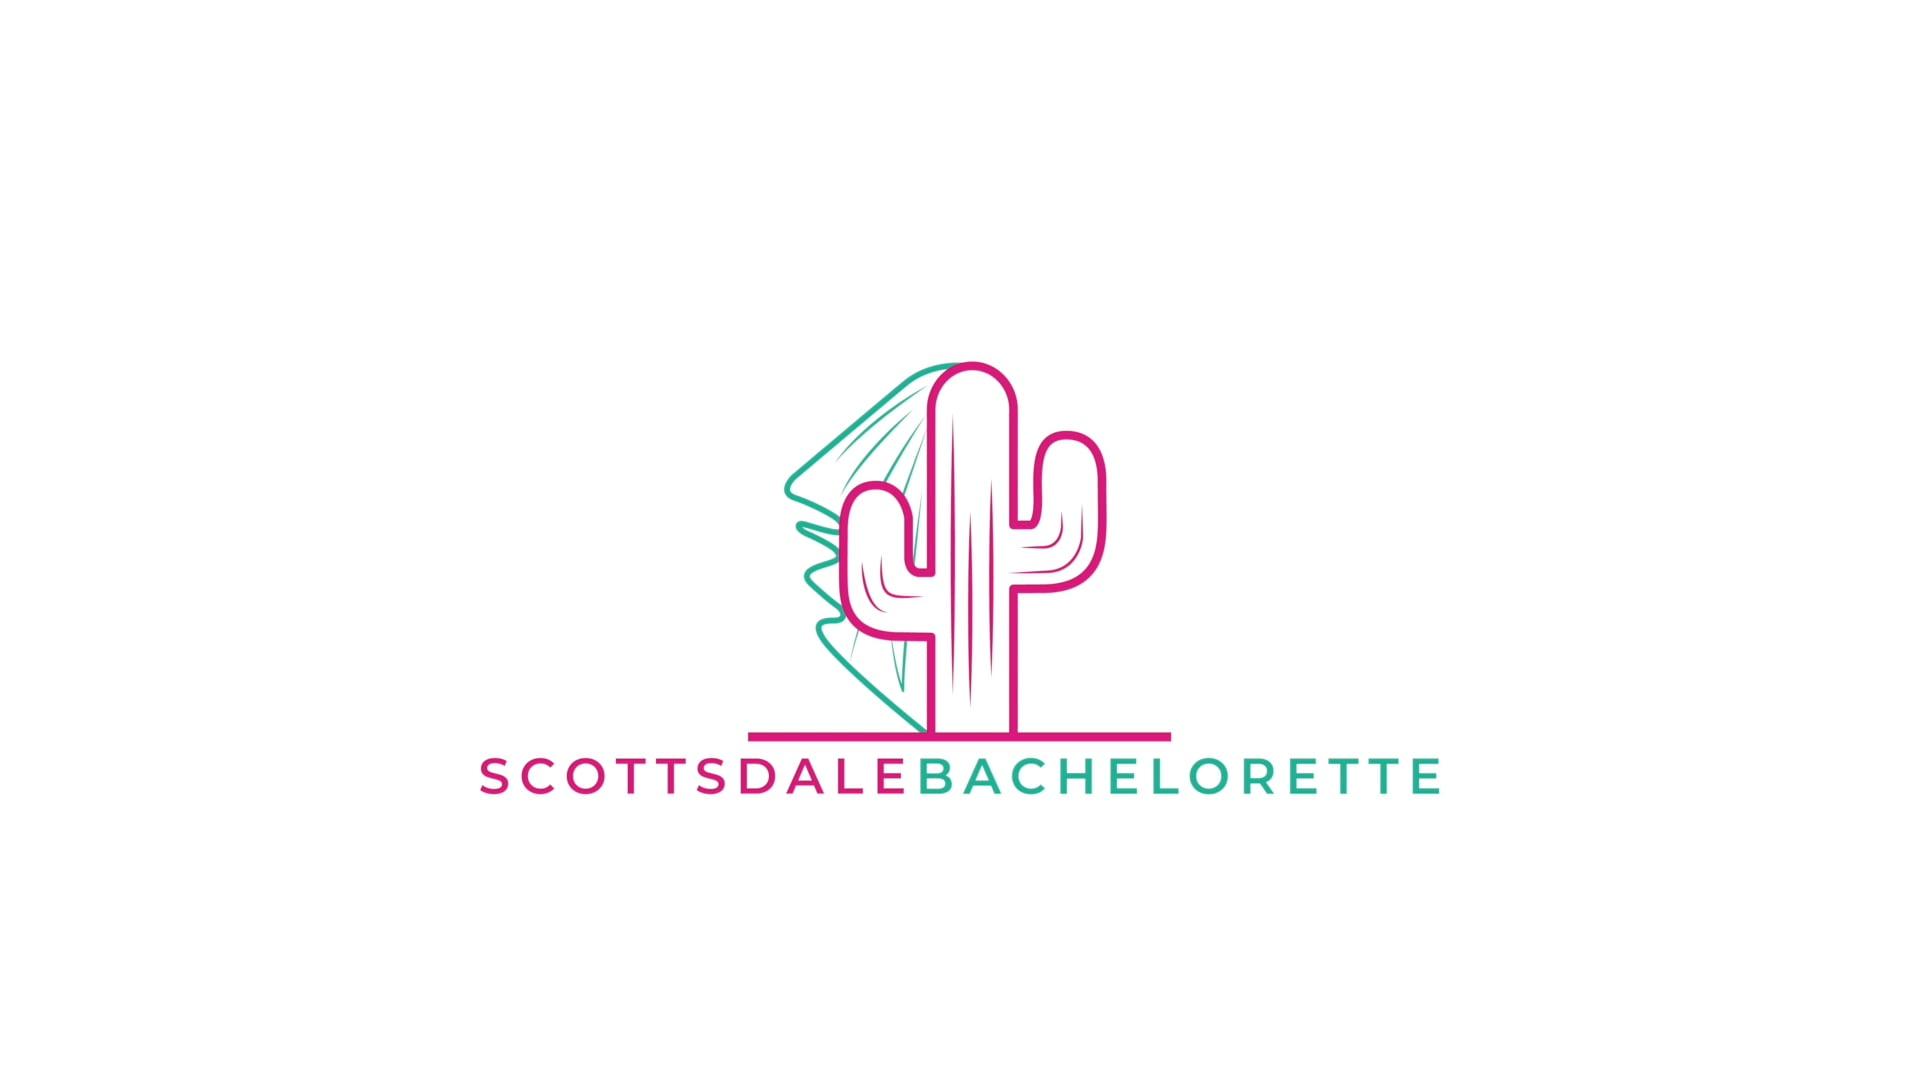 Scottsdale Bachelorette promo